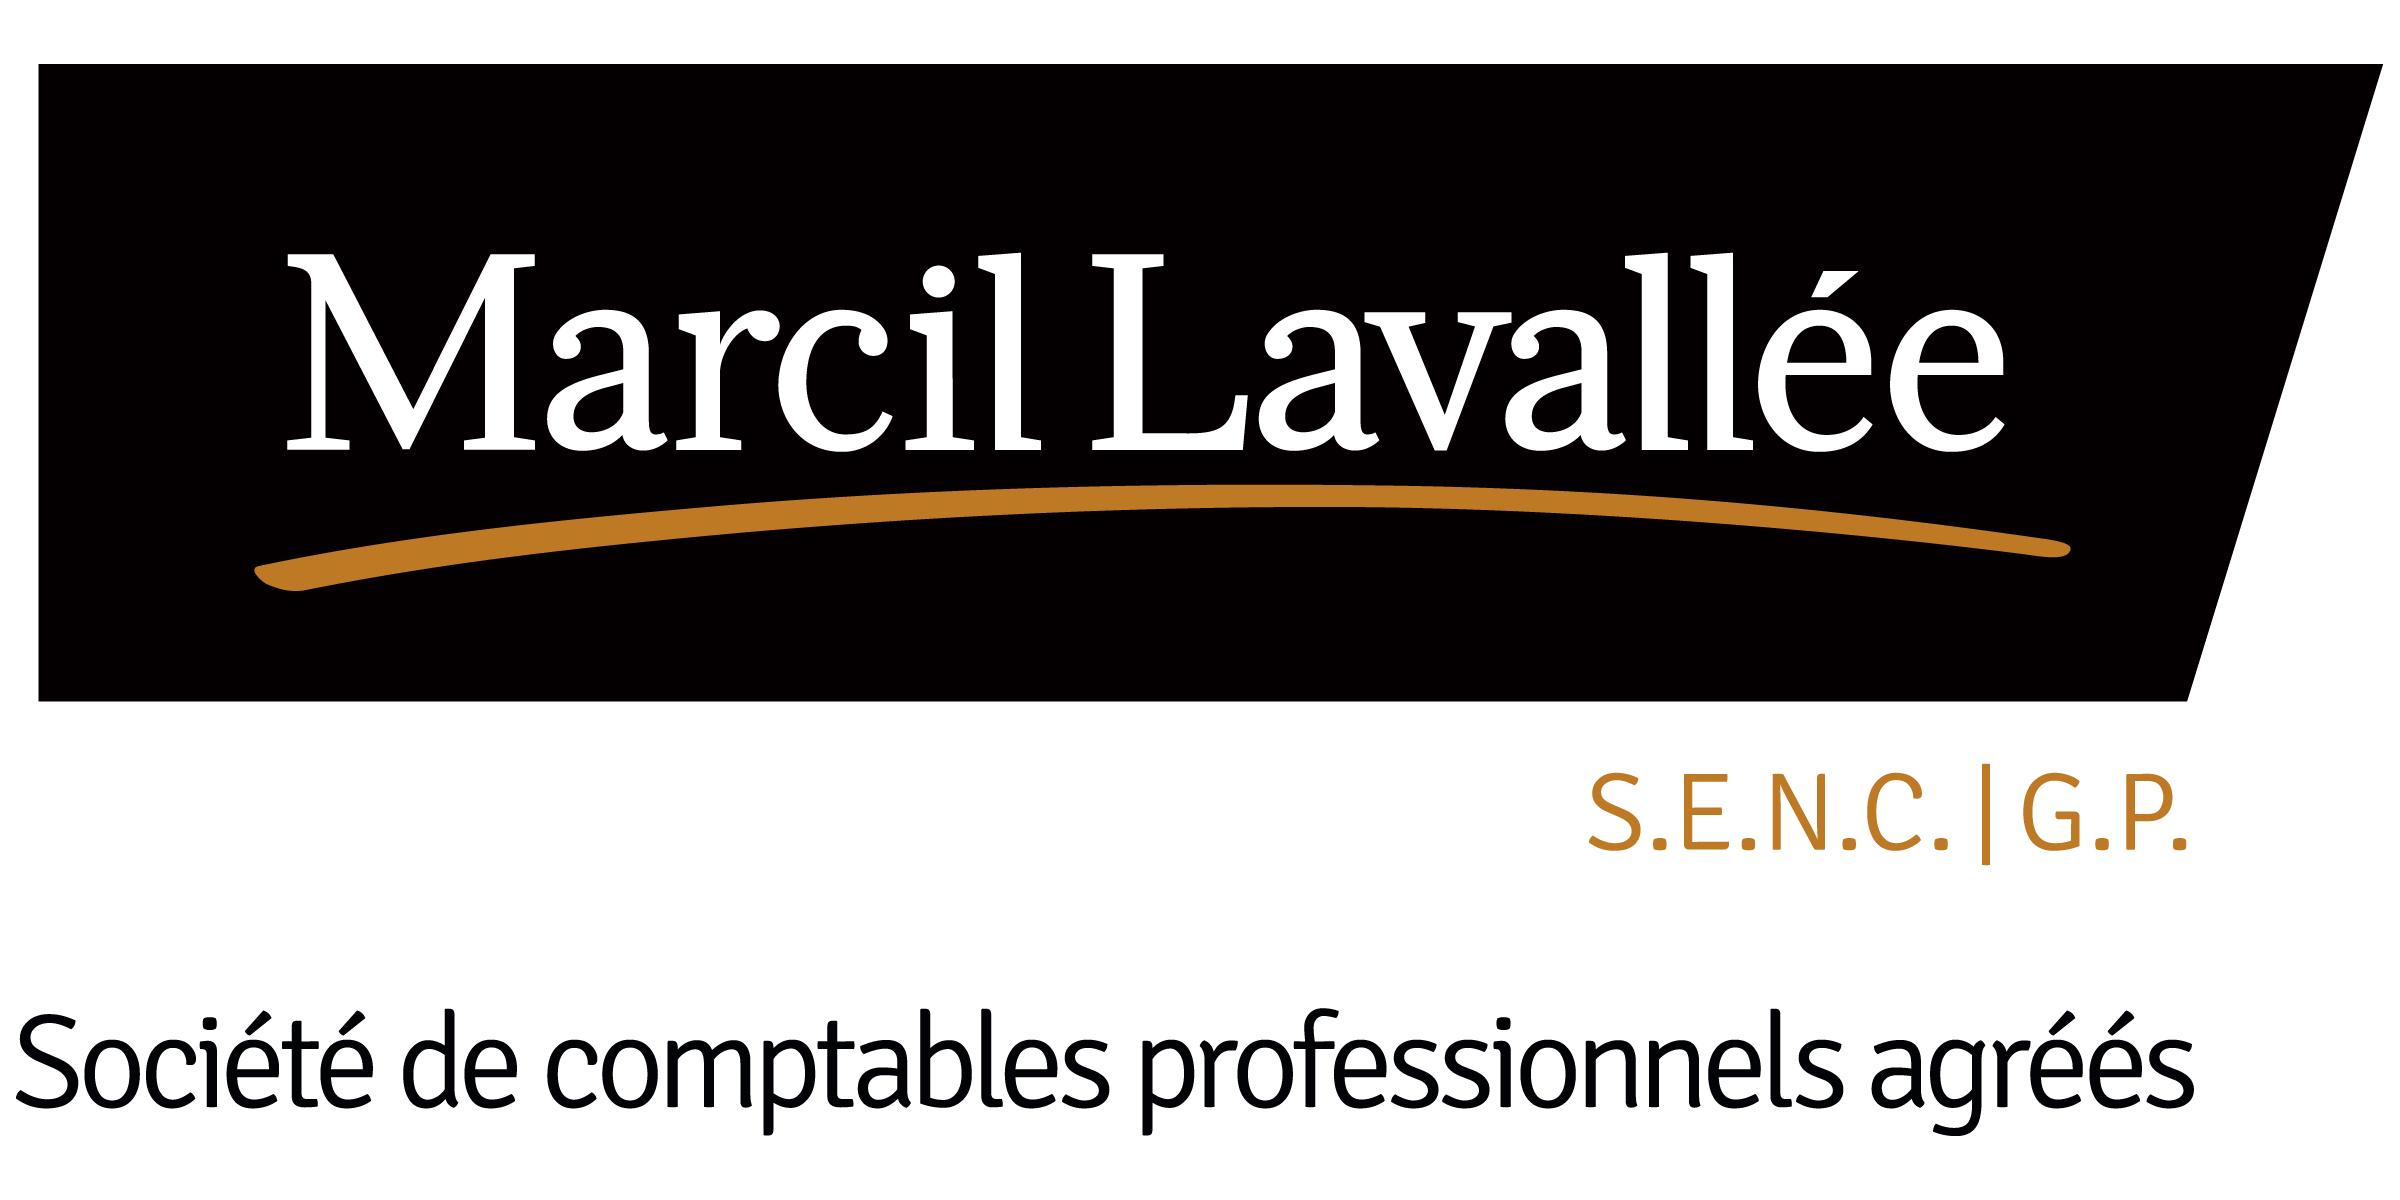 Marcil Lavallée